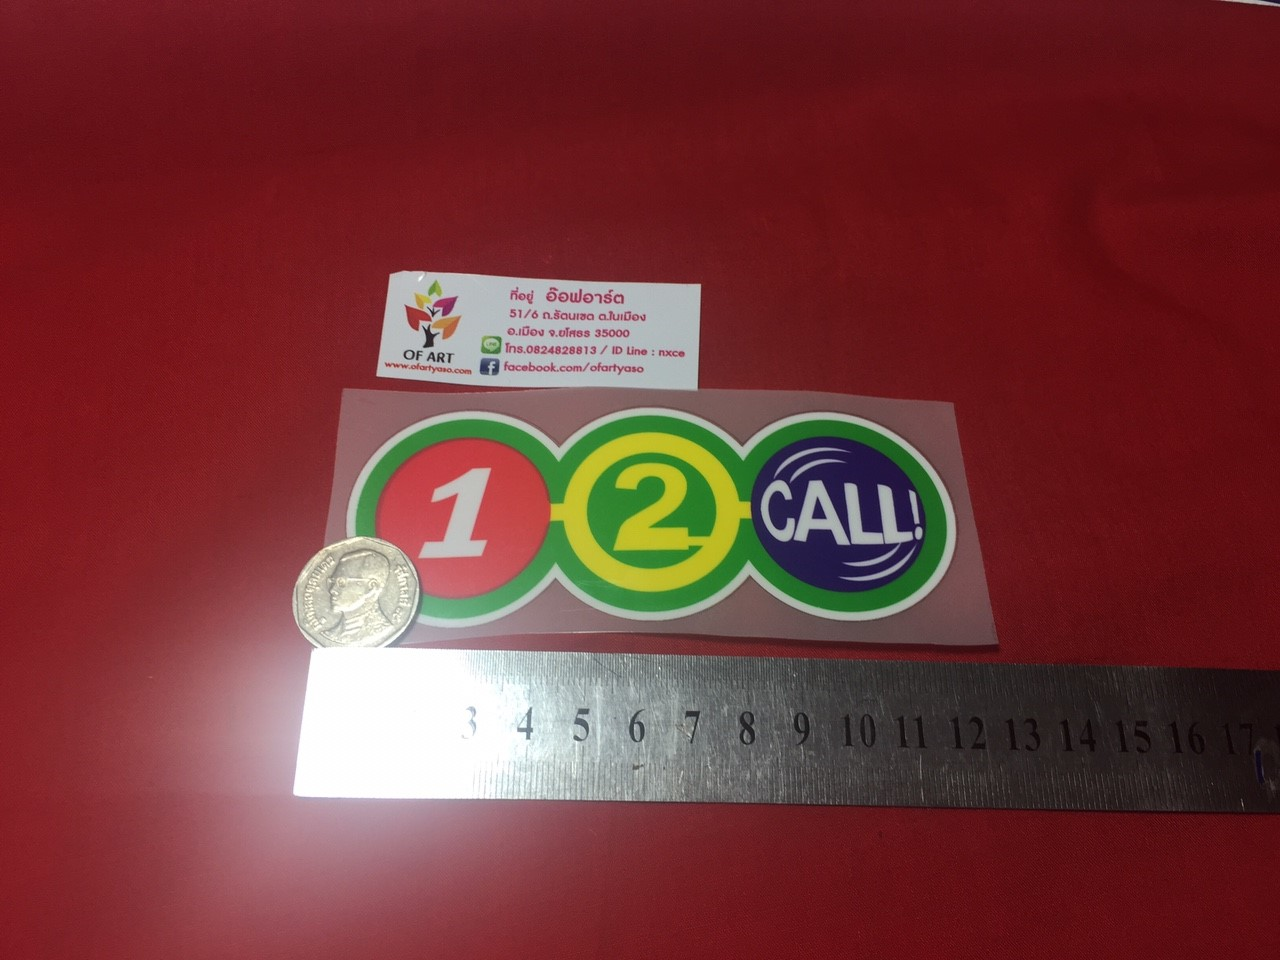 One-Two-Cell ขนาดเล็ก 10 บาท (ขั้นต่ำ 10 ชิ้น)